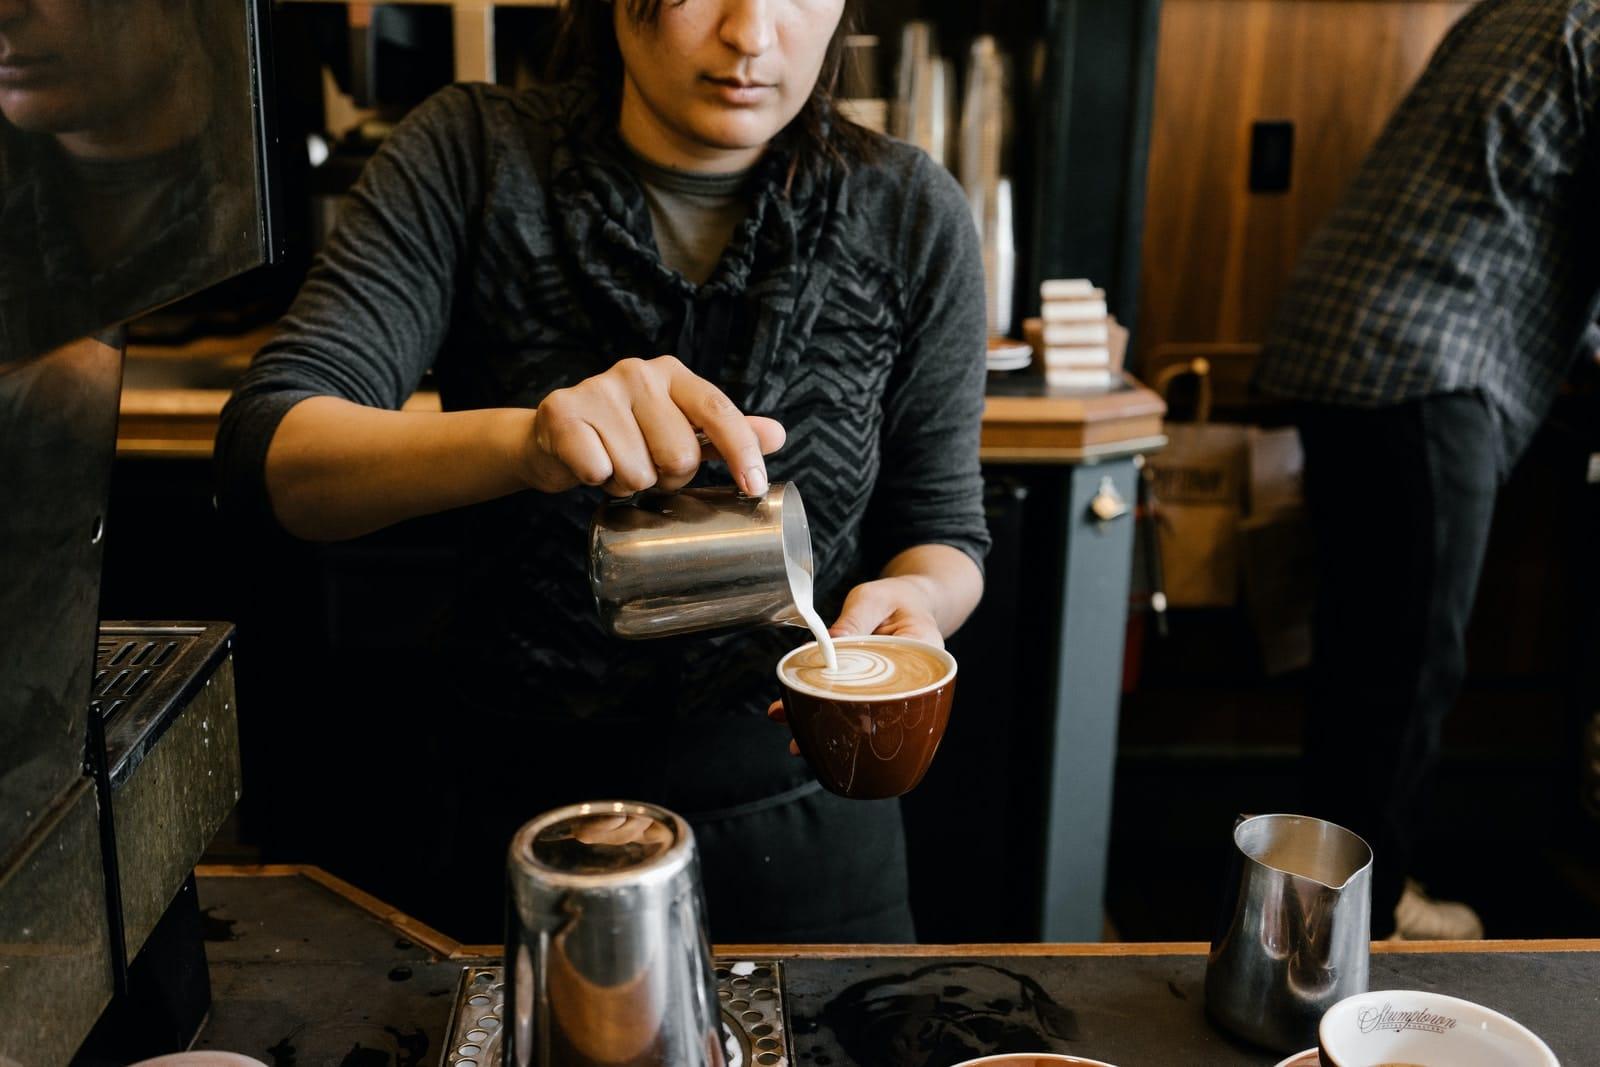 person making latte